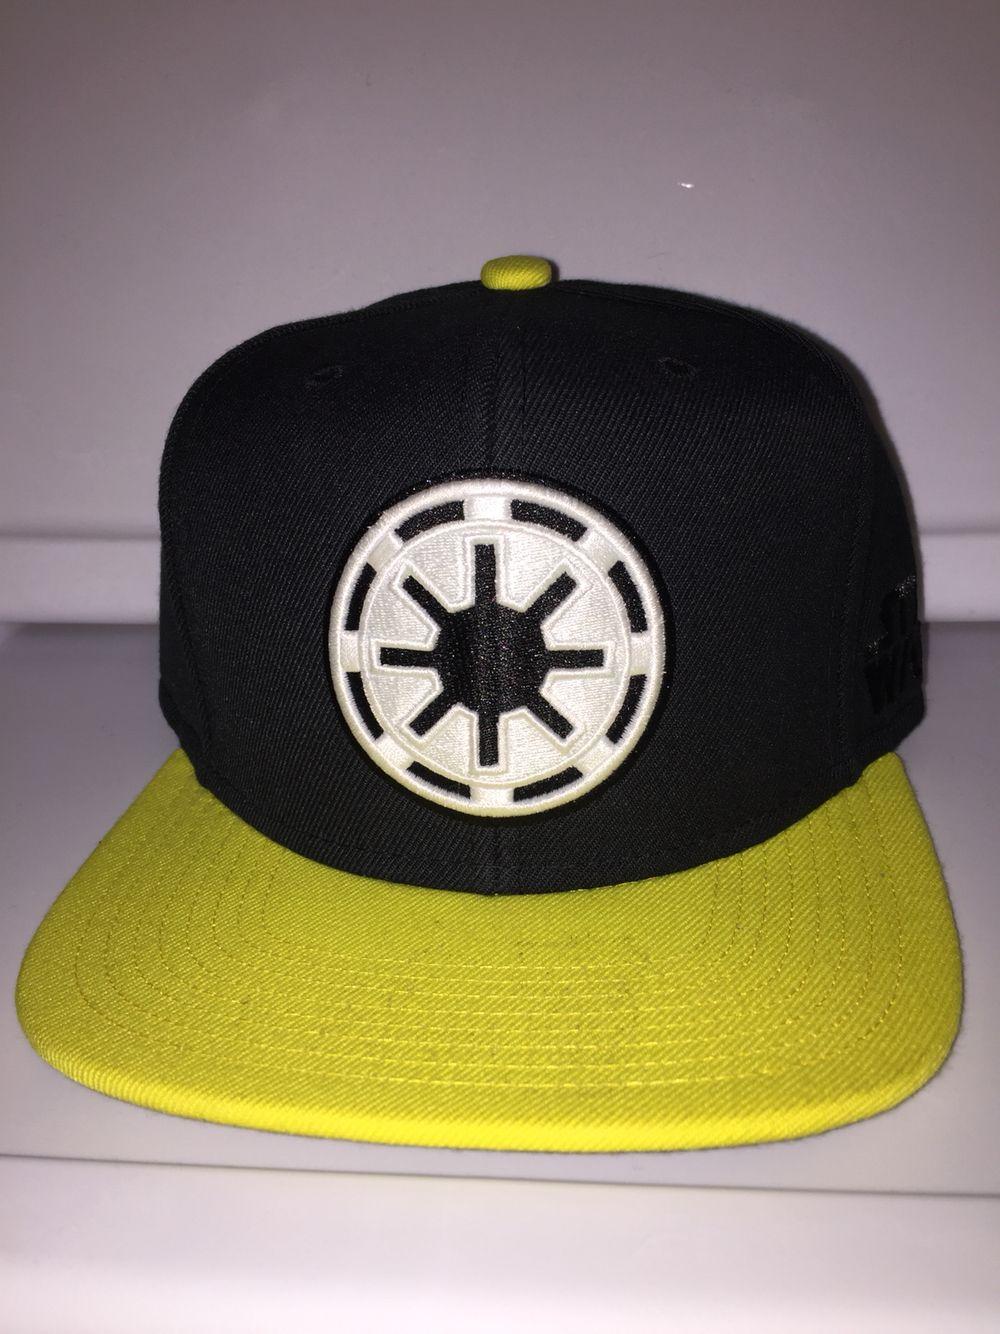 Star Wars starter snapback imperial symbol black with yellow brim C-3PO  under brim f99ab0215ef8